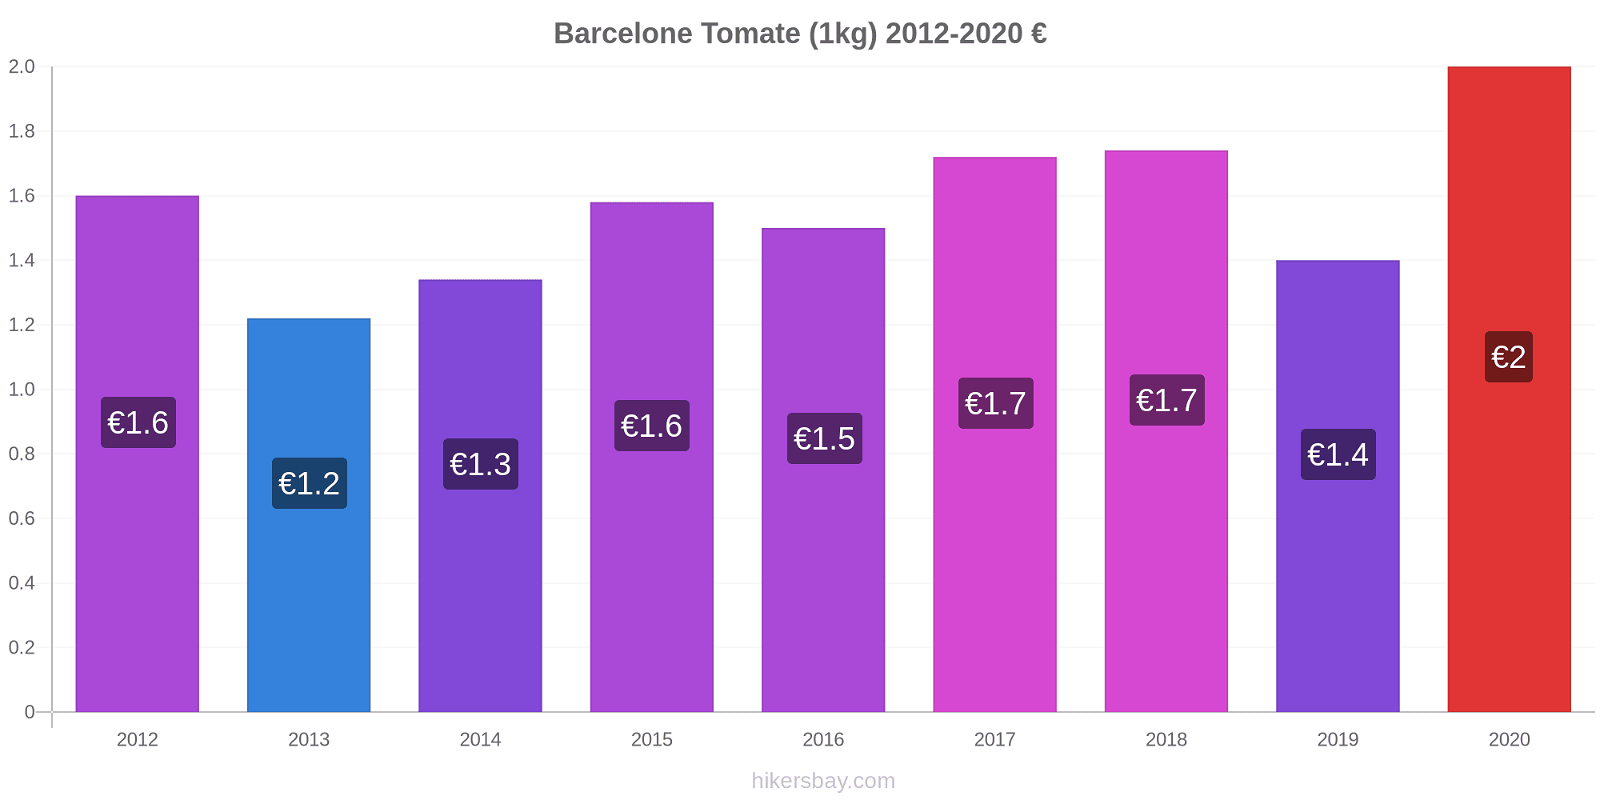 Barcelone changements de prix Tomate (1kg) hikersbay.com